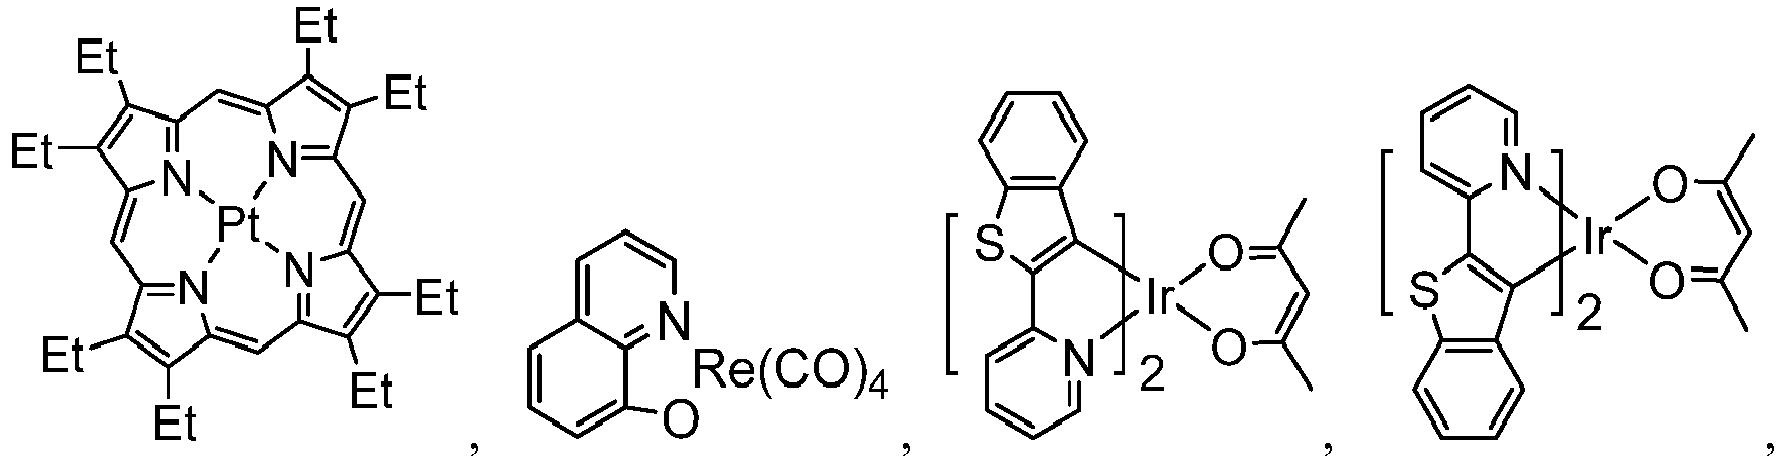 Figure imgb0908